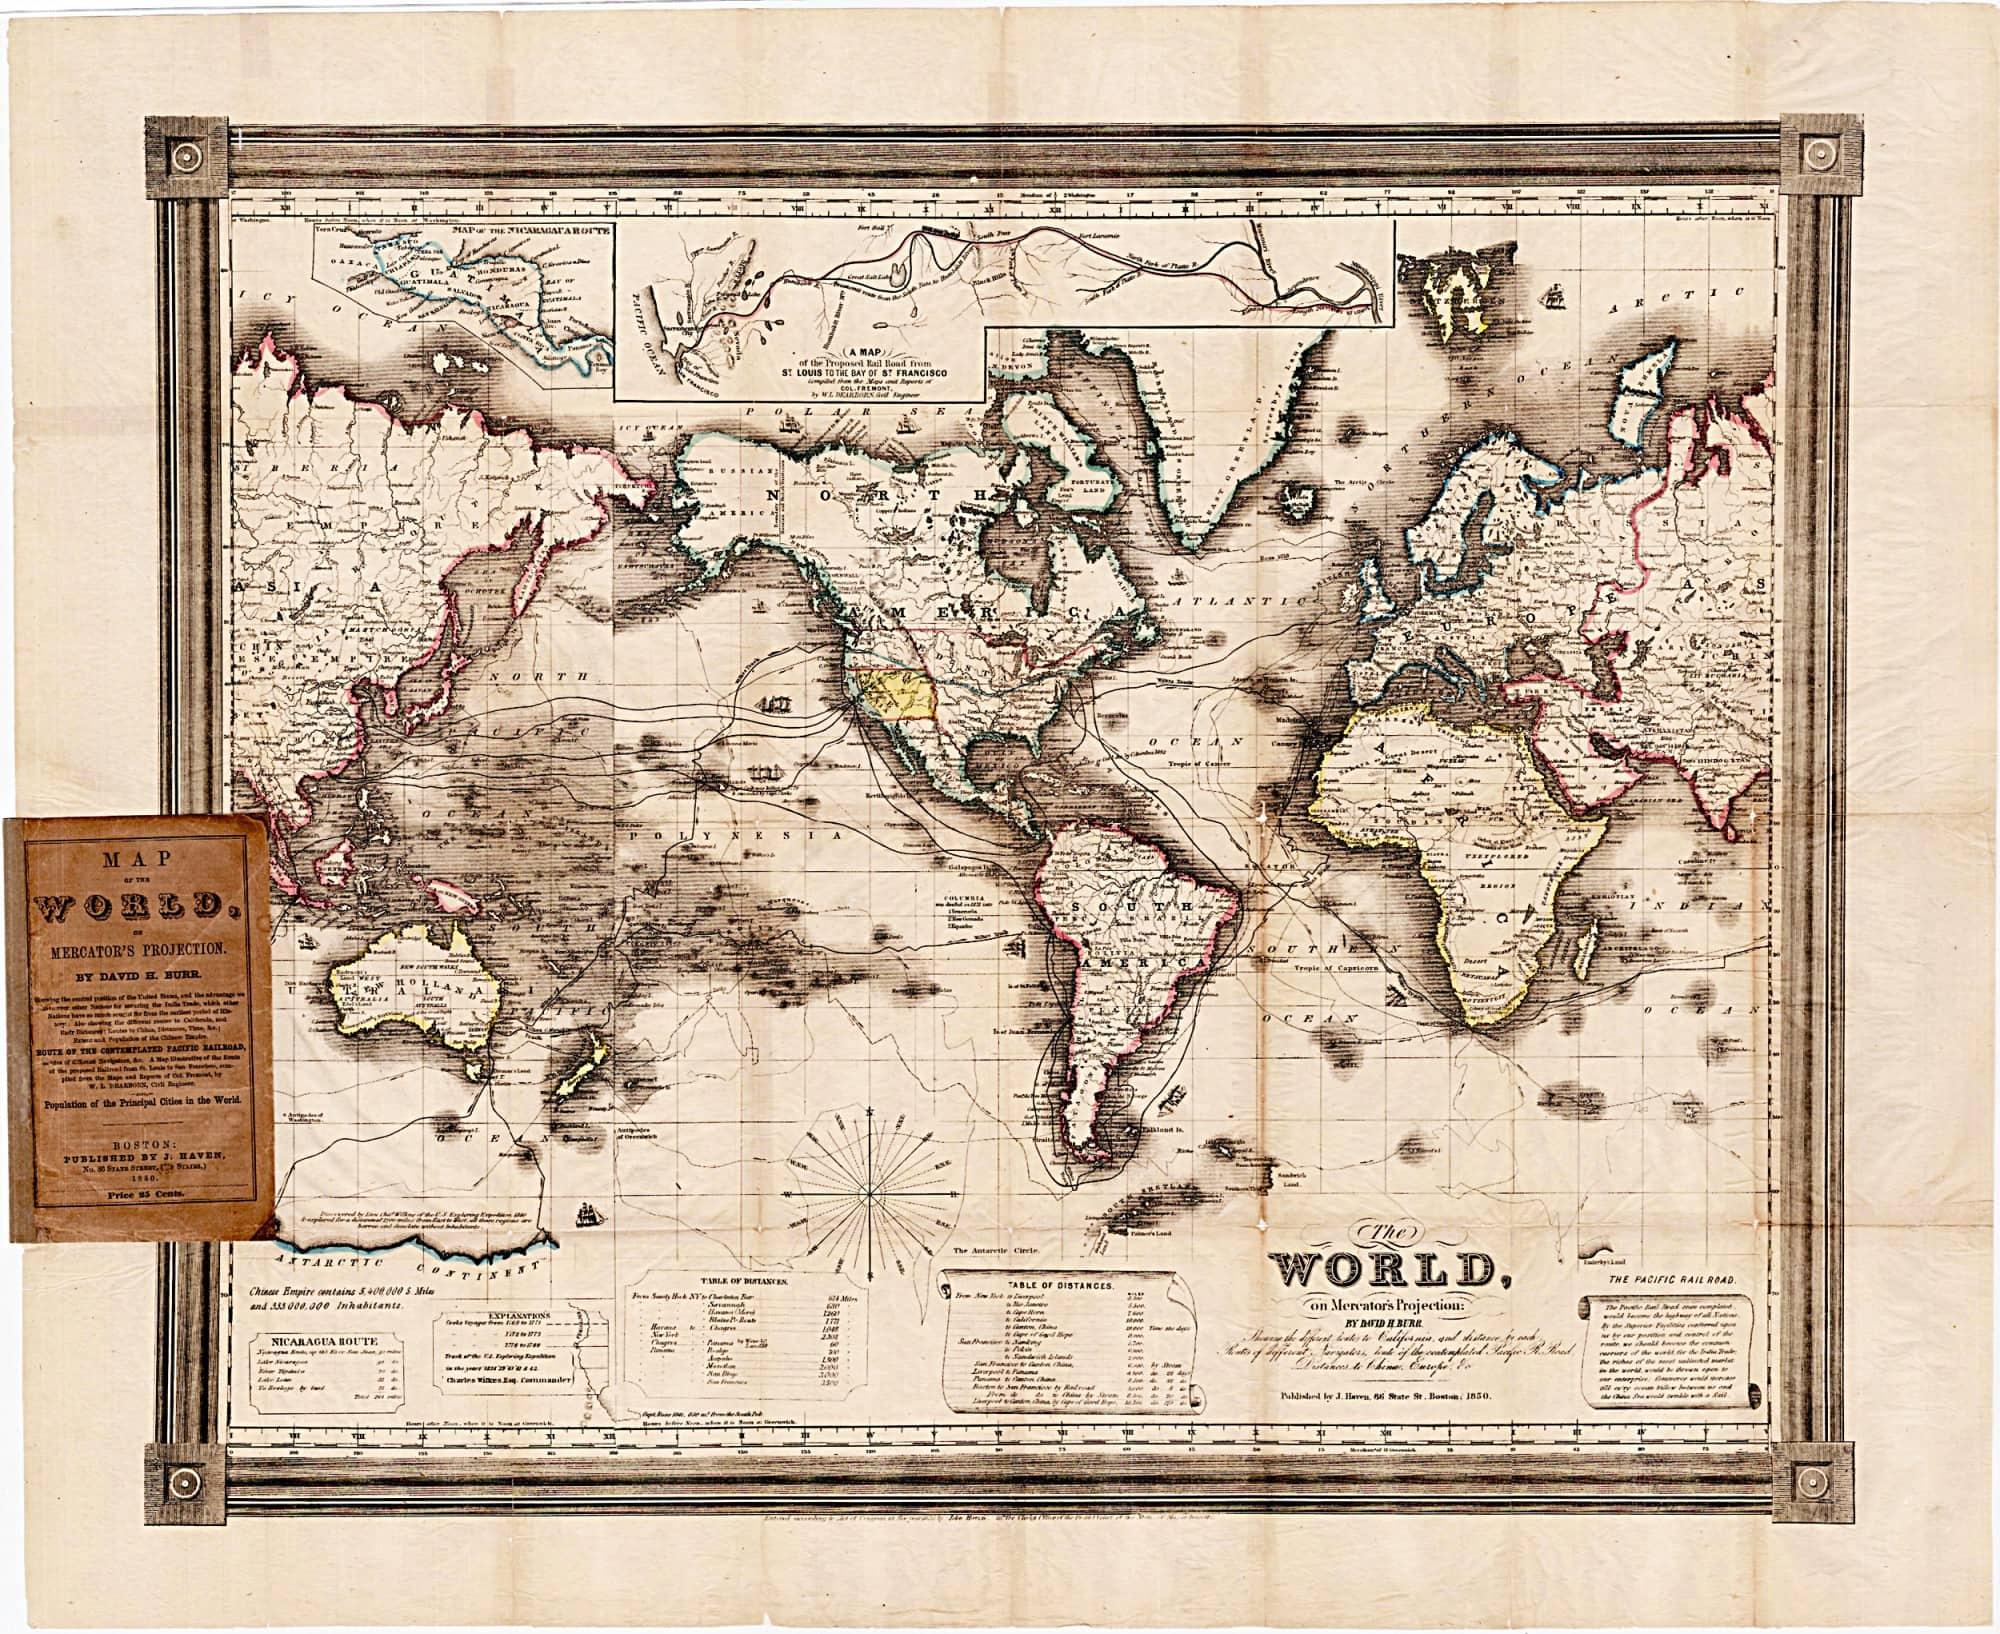 A Rare Gold Rush Era Map Promoting A Transcontinental